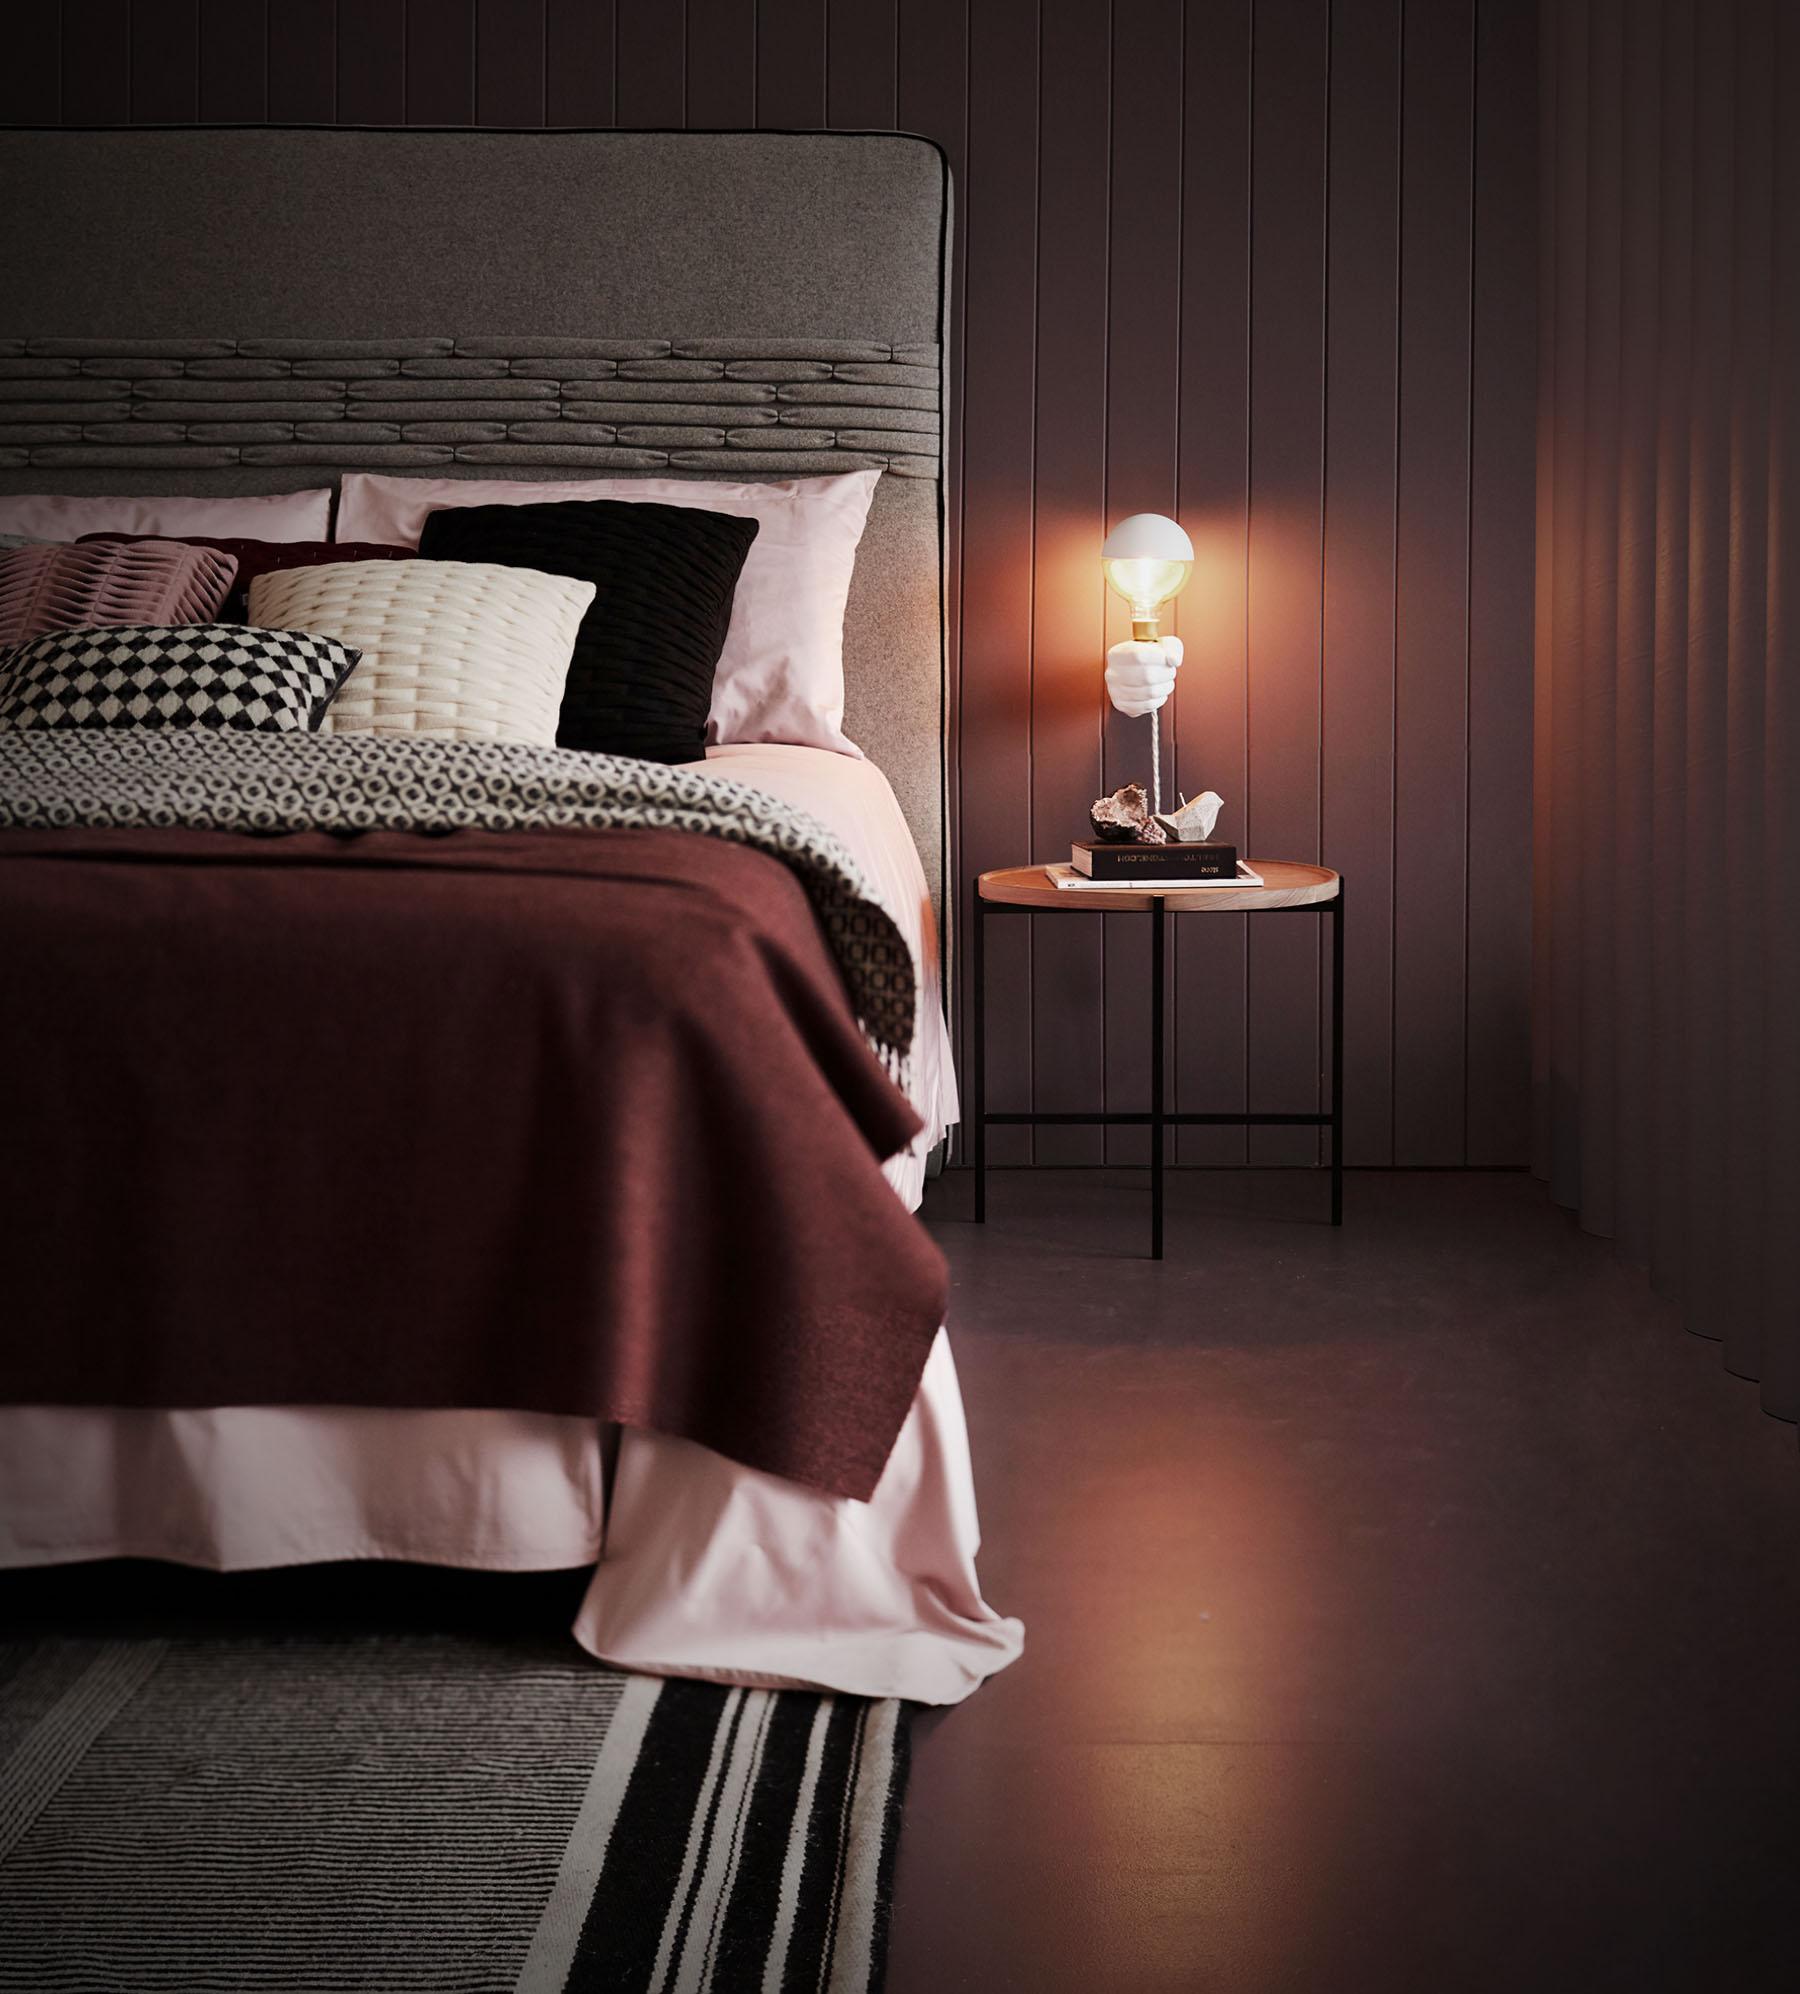 Figgoscope pop-up-Nido Studio Interior Design-bedroom3.jpg